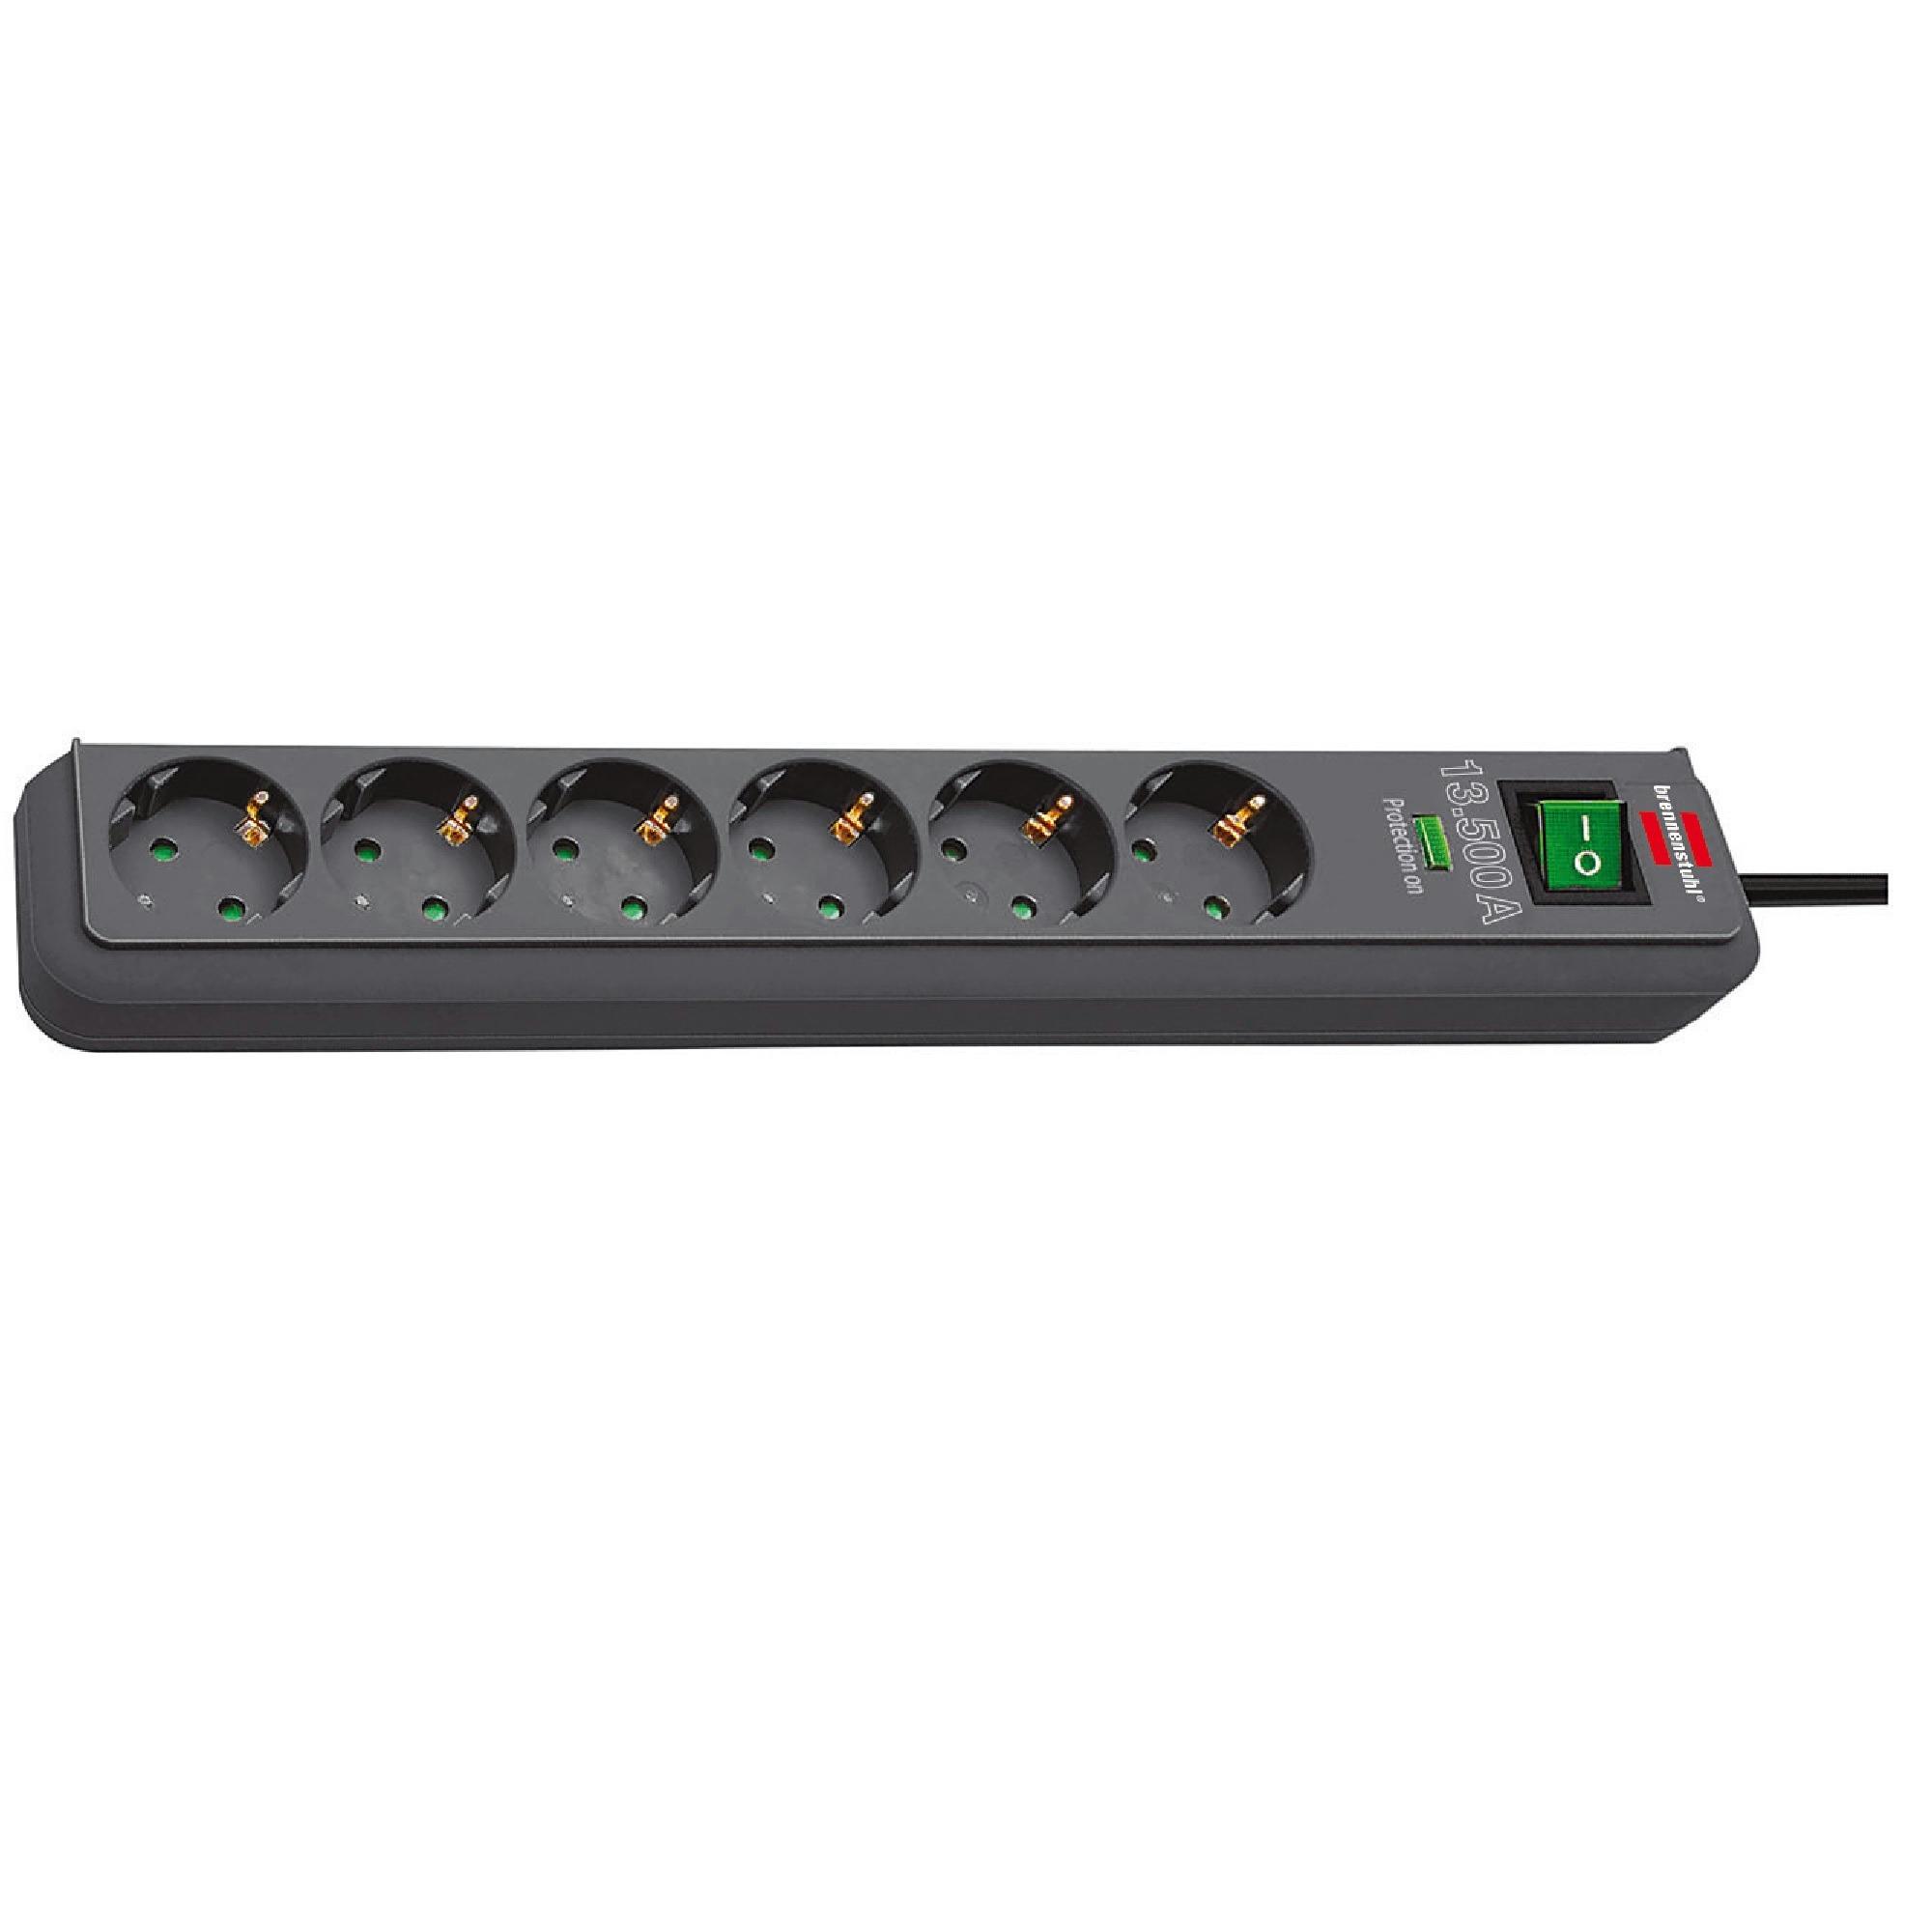 Eco-Line 13500A +surge protection 6x